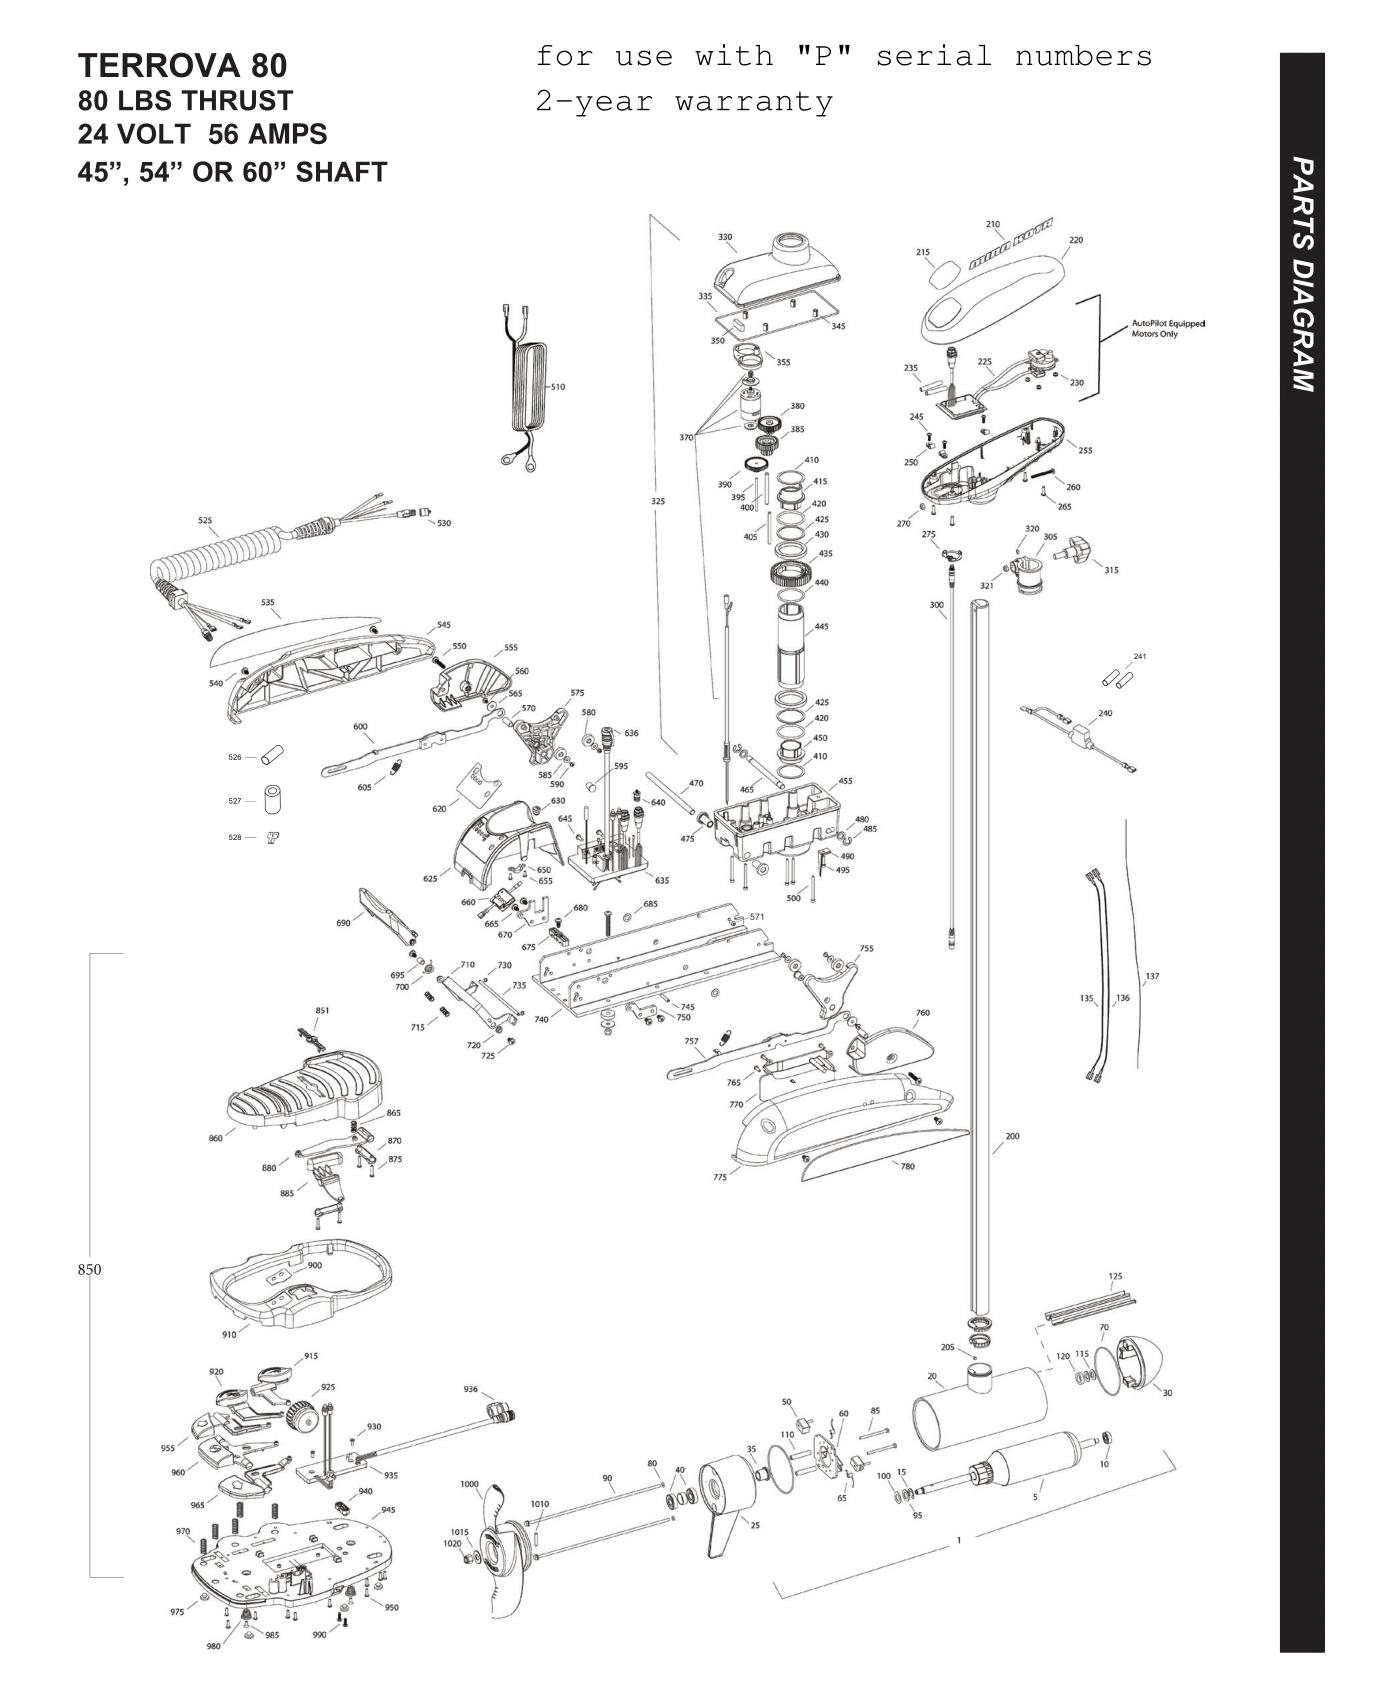 hight resolution of 2015 mk terrova80 1 png